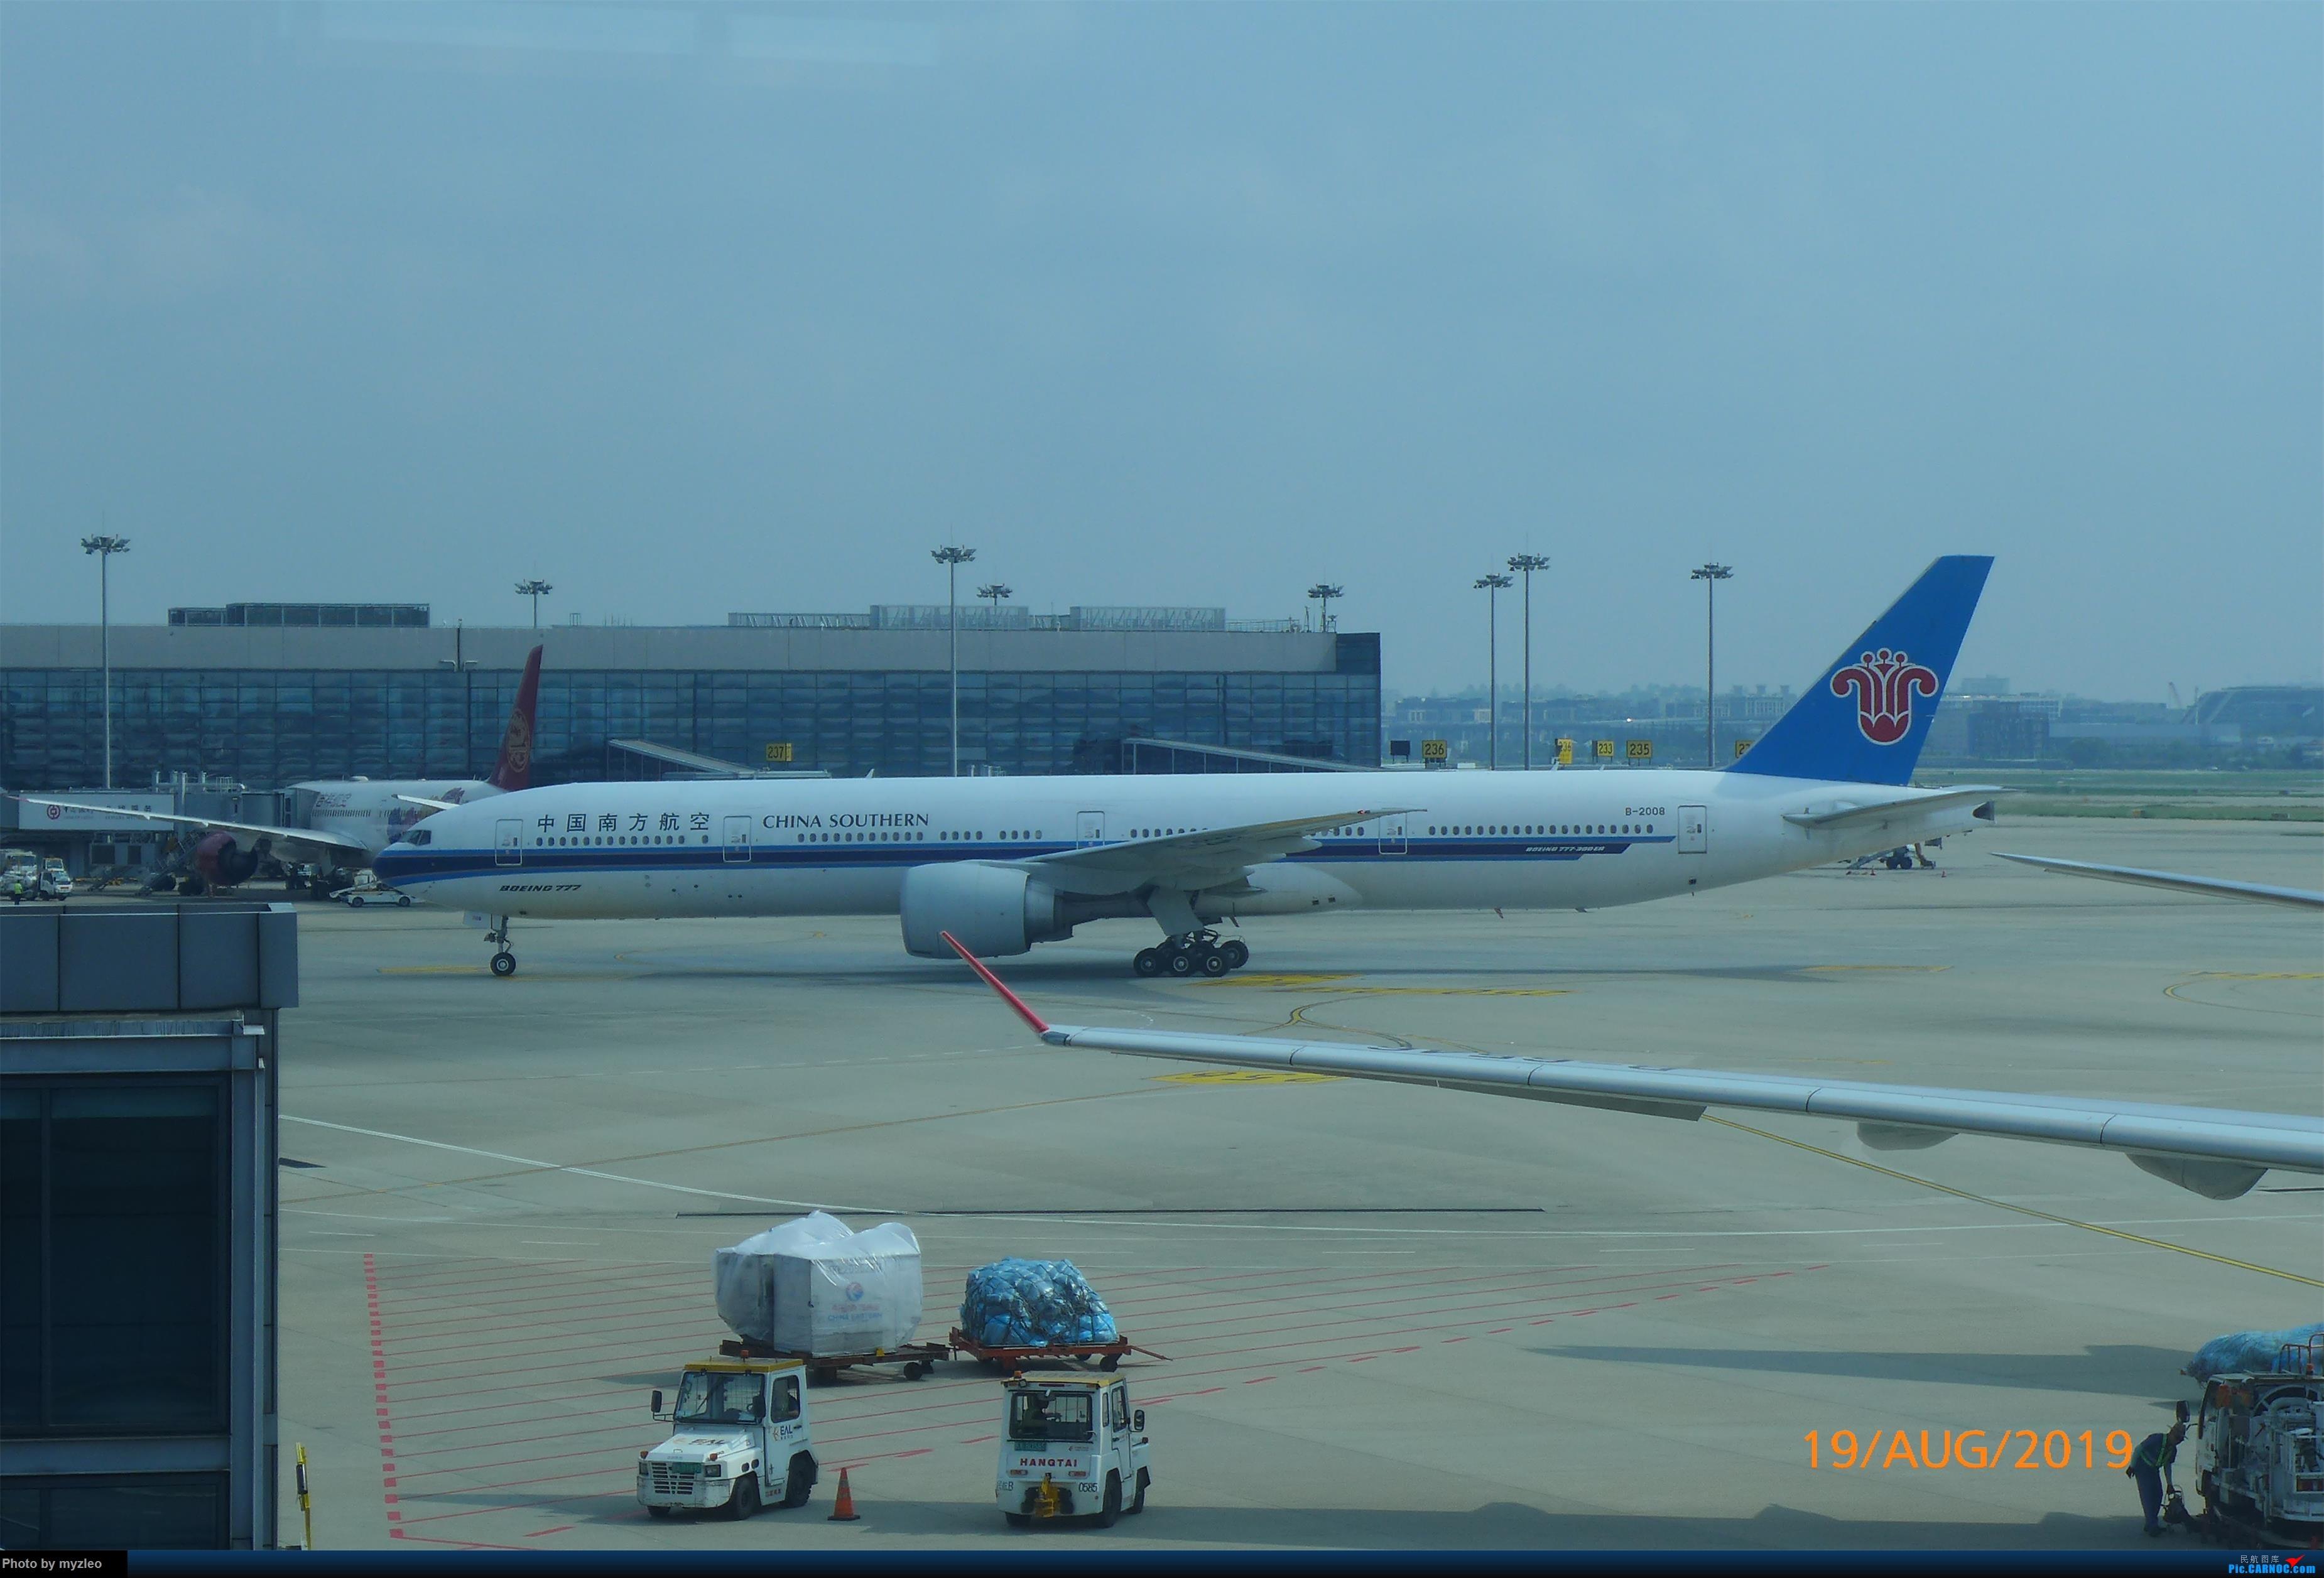 Re:[原创]【myzleo的游记5.1】梦圆一九(1)首搭国航359,北京城里到处走 BOEING 777-300ER B-2008 中国上海虹桥国际机场